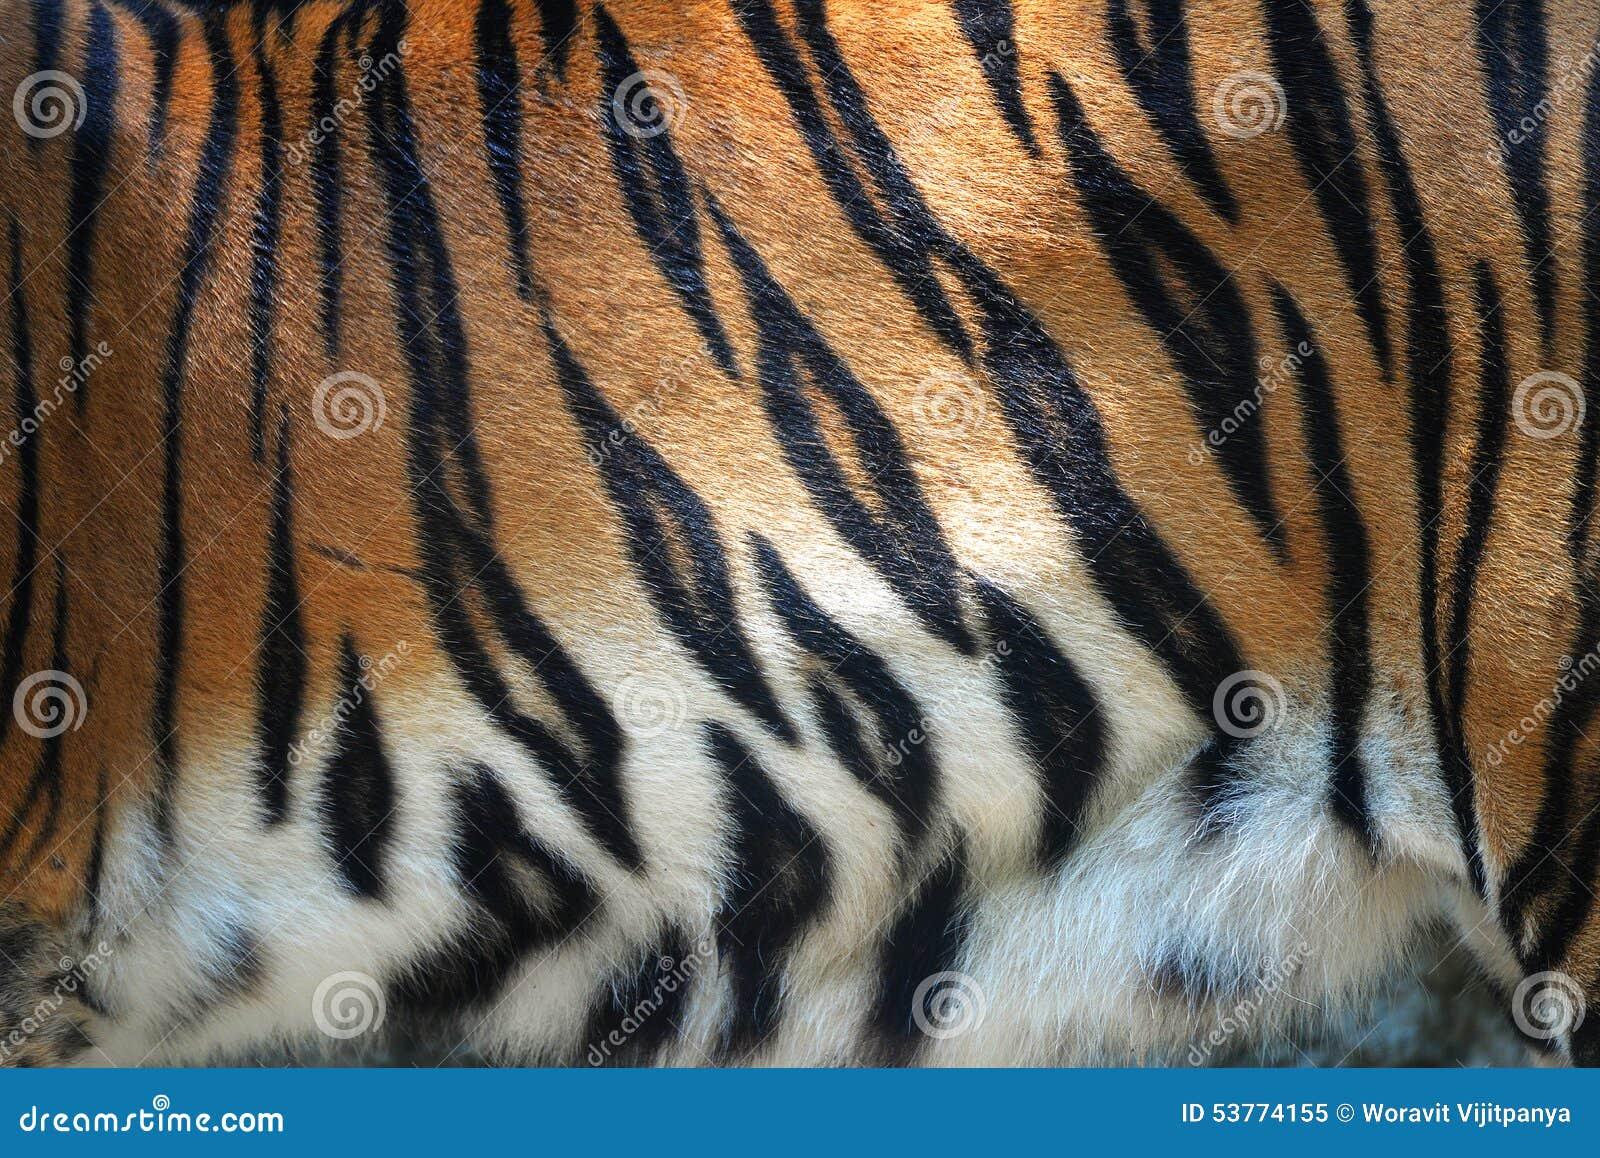 Tiger Fur Stripe Pattern Background